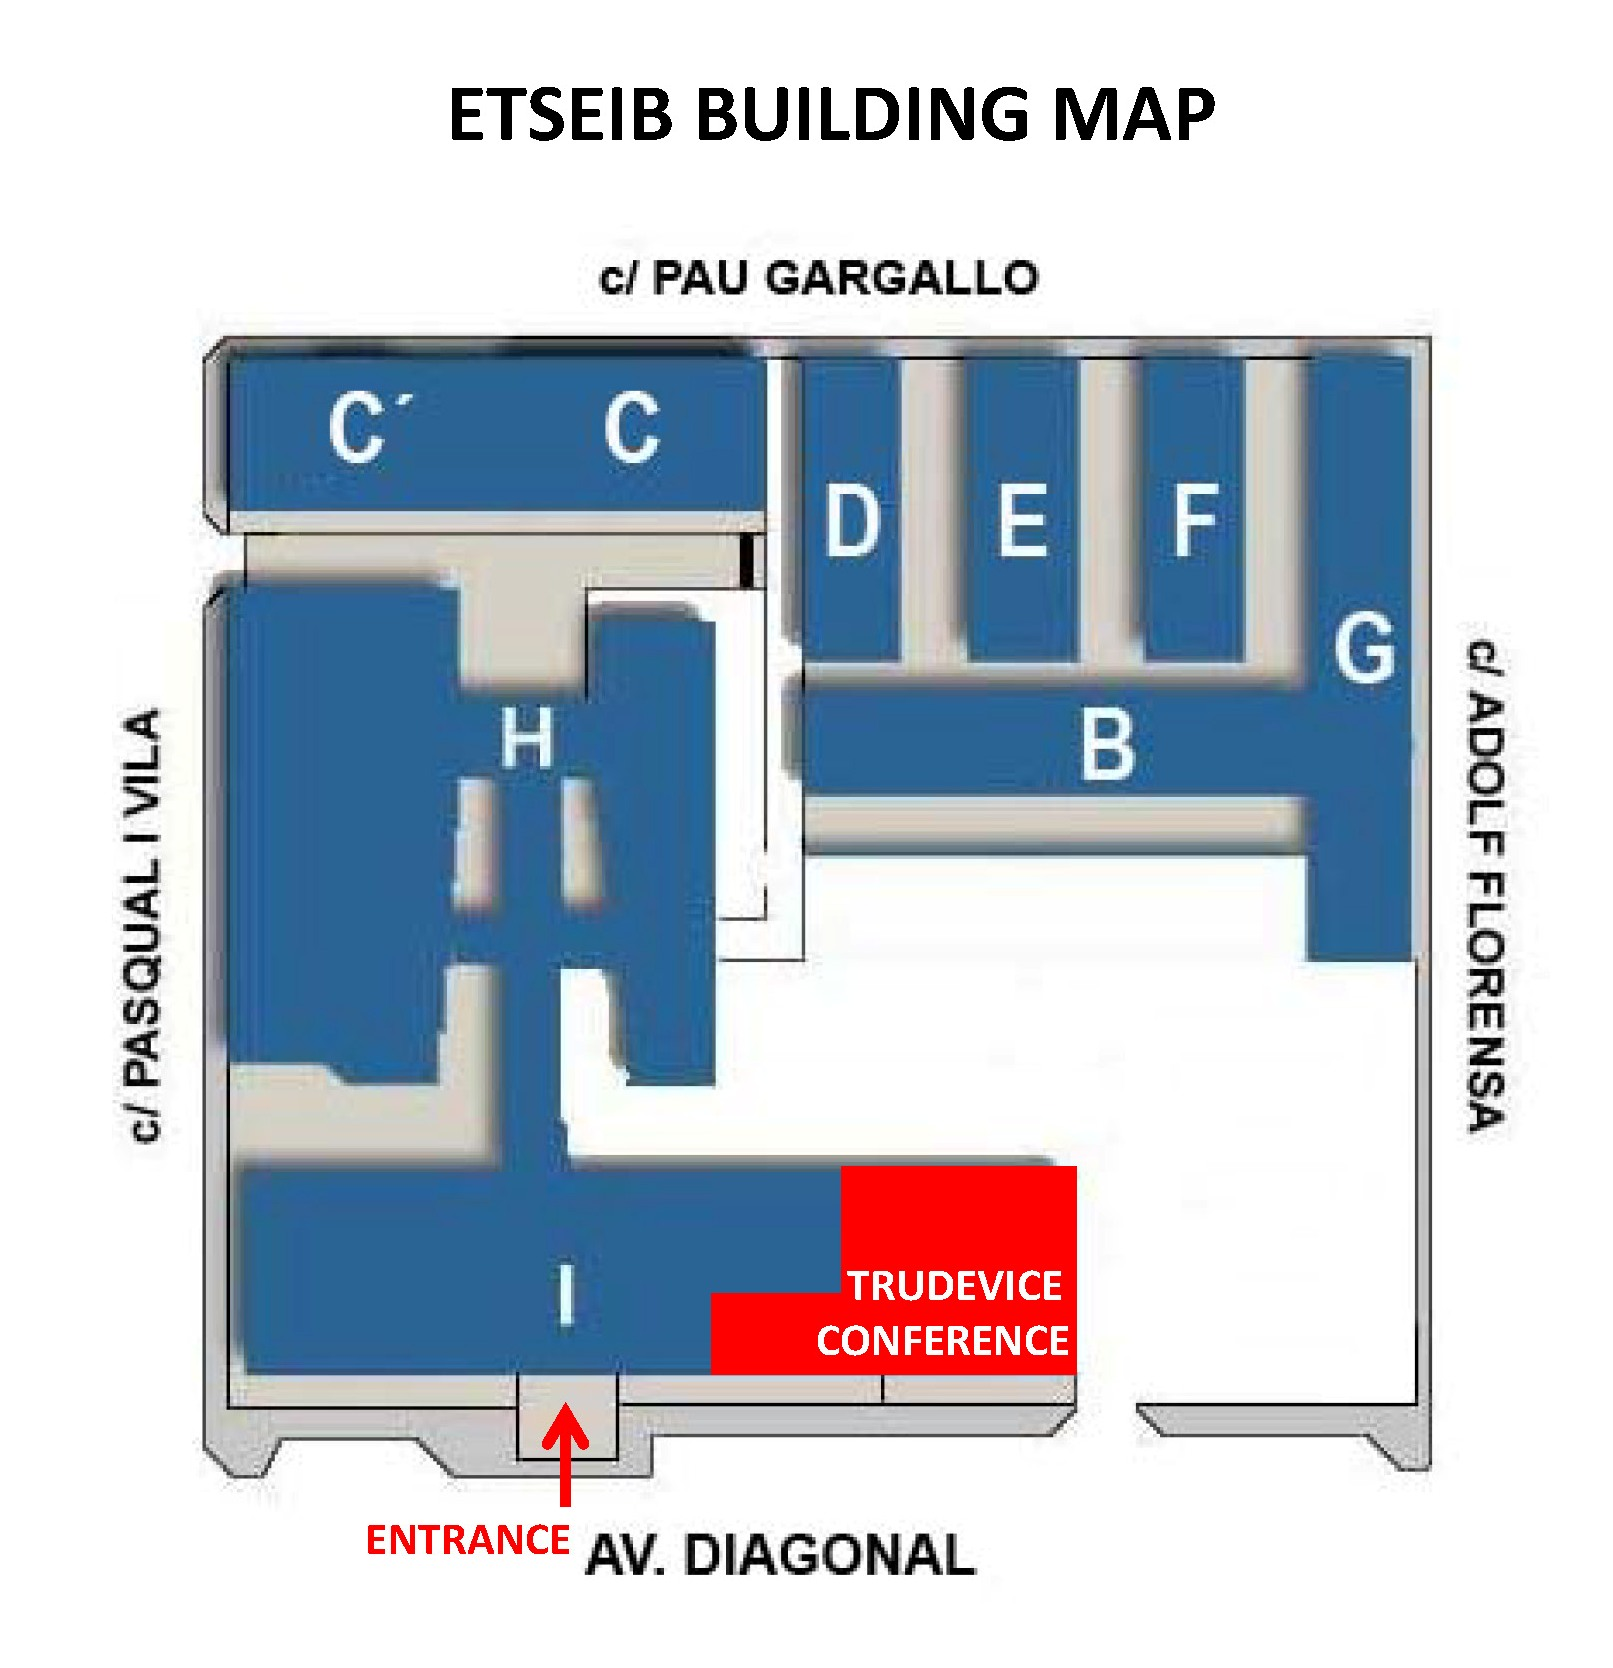 etseib_map.jpg